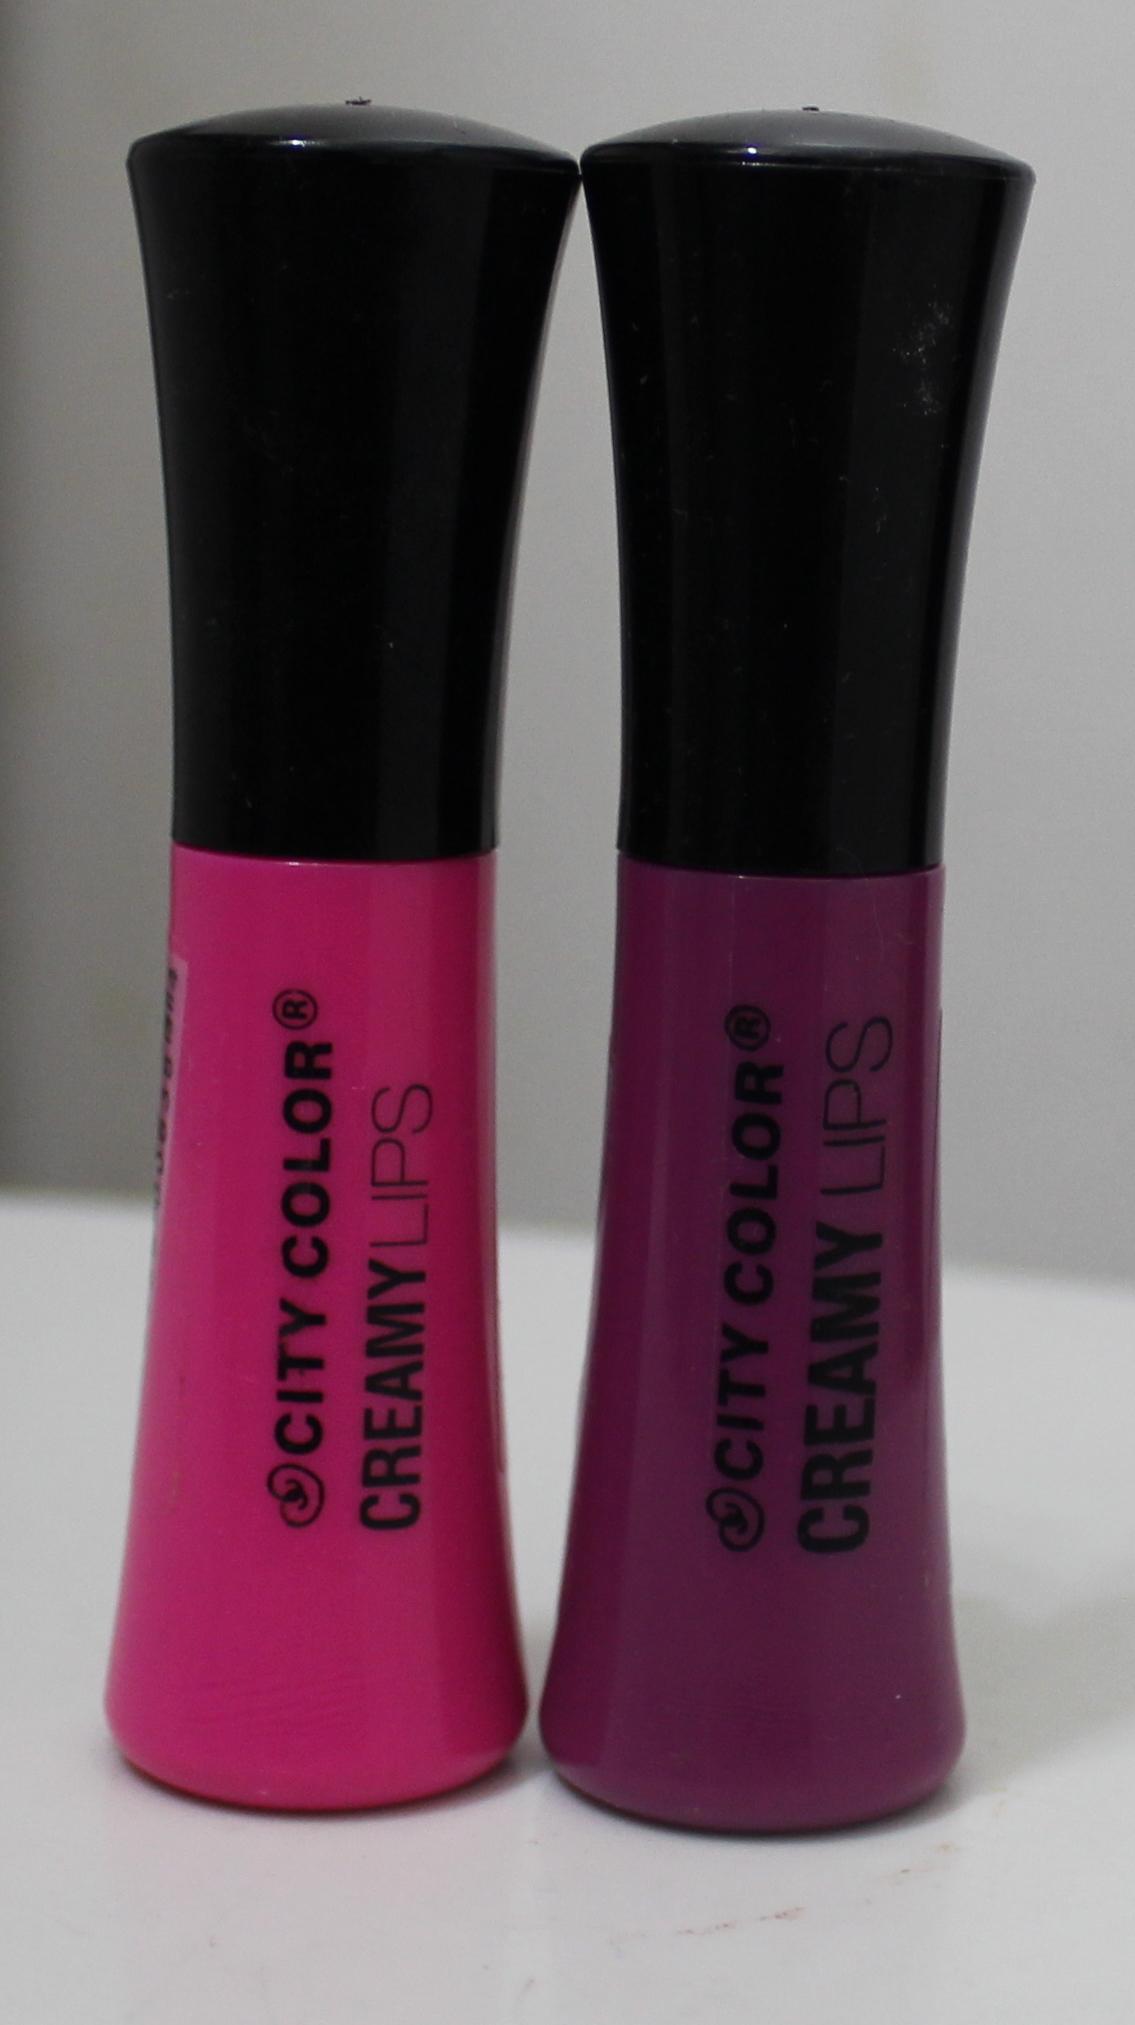 Ticked Pink Cosmo & Blackberry Mojito - $4.99